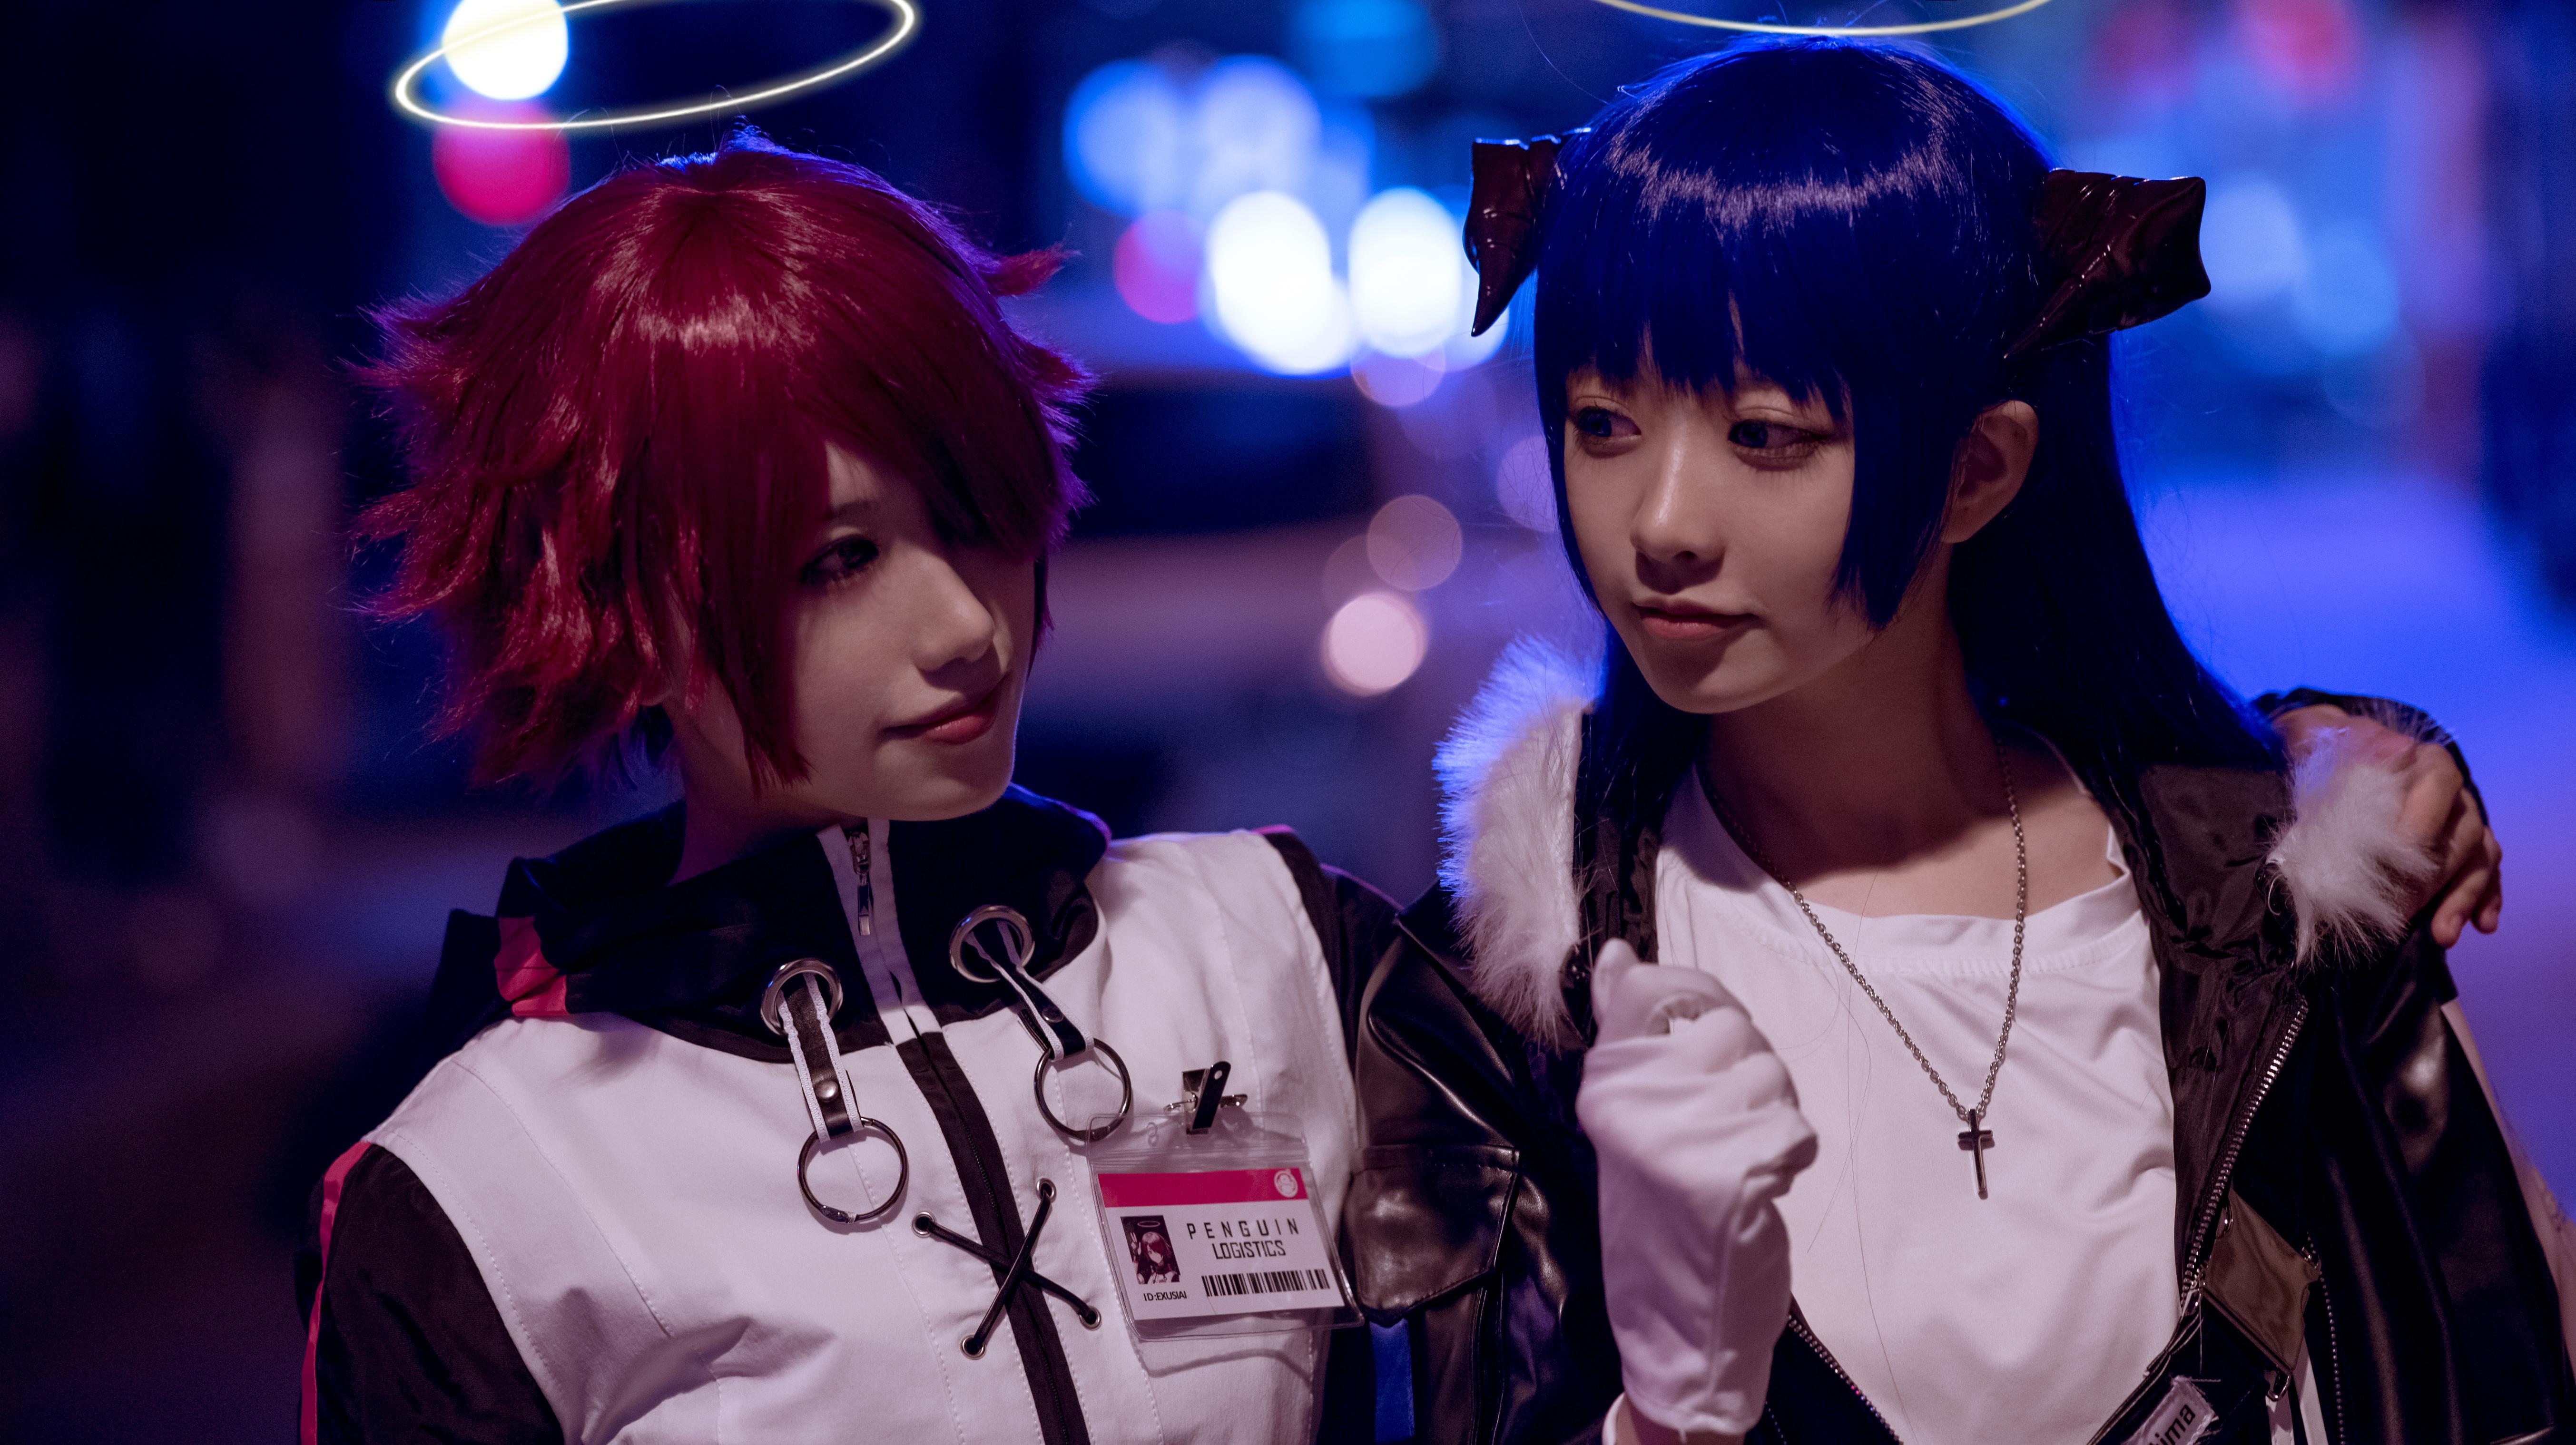 《明日方舟》法则cosplay【CN:KizunaFerin】-第27张